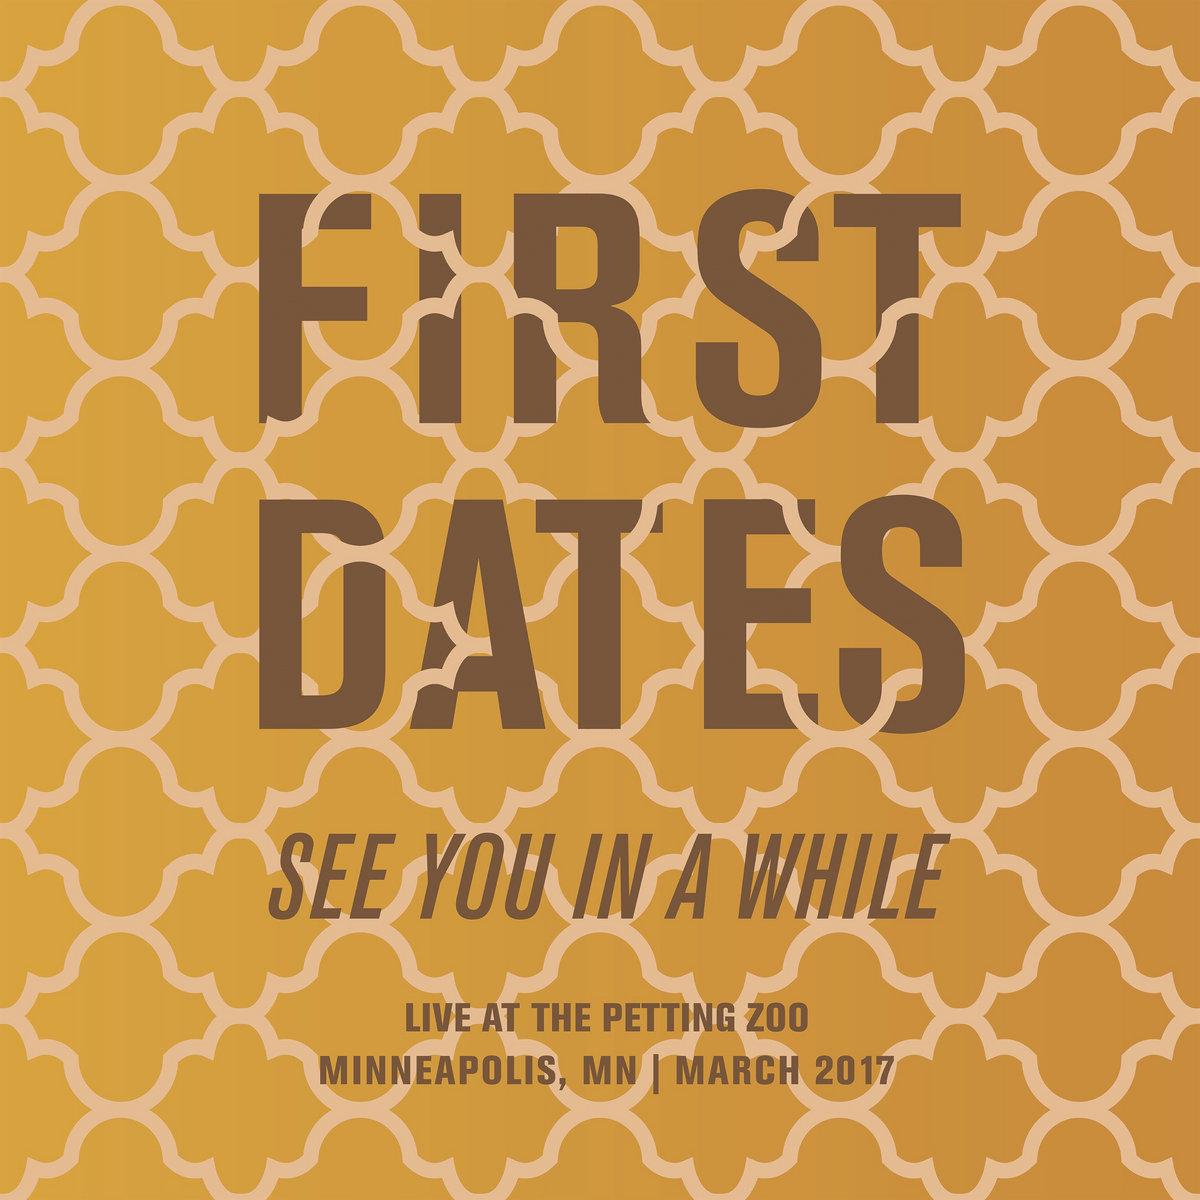 First date ideas minneapolis